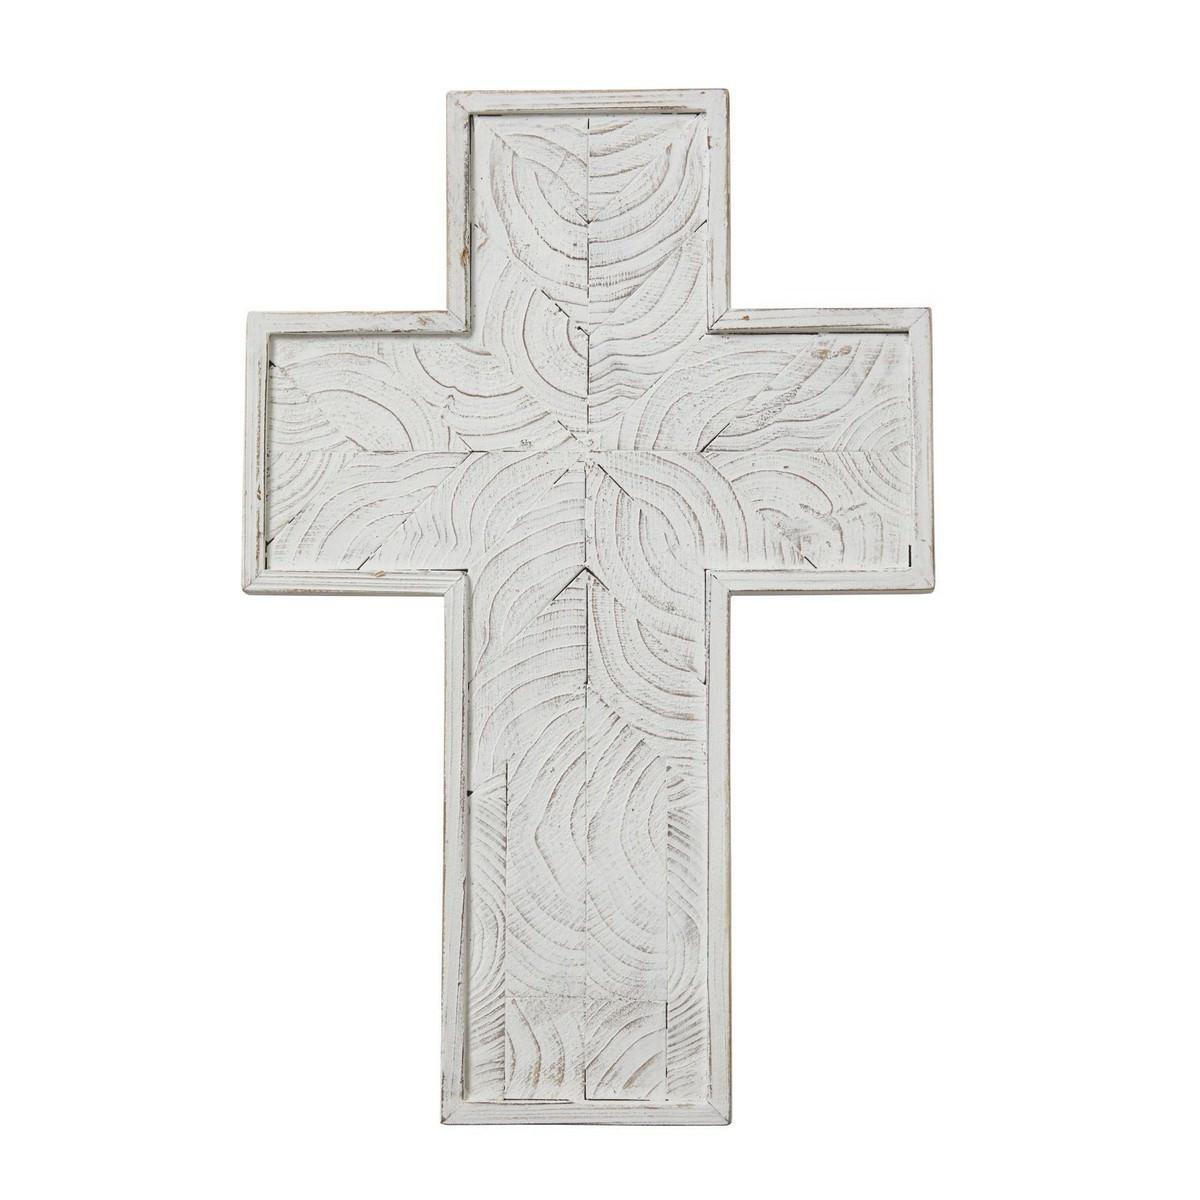 Northford Wooden Cross Wall Decor, Large